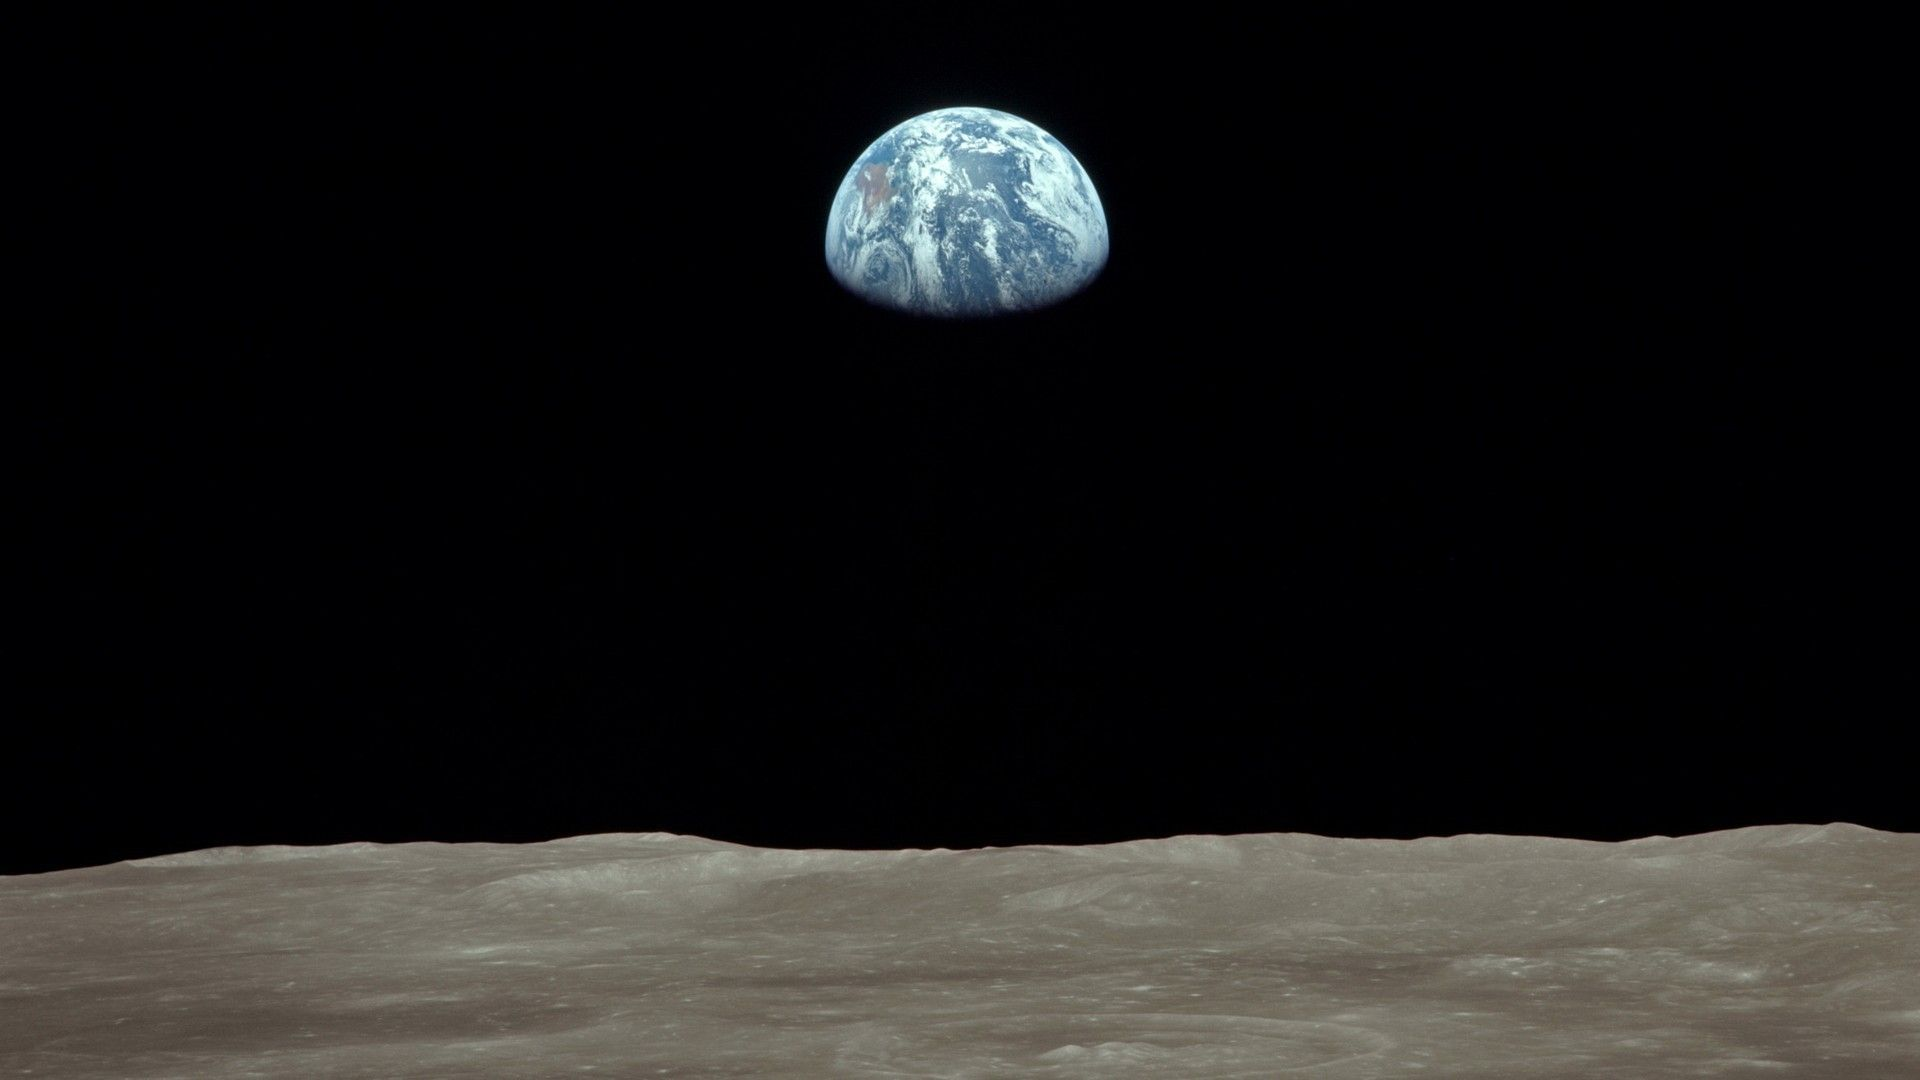 Earth moon nasa astronomy earthrise (1920x1080, moon, nasa